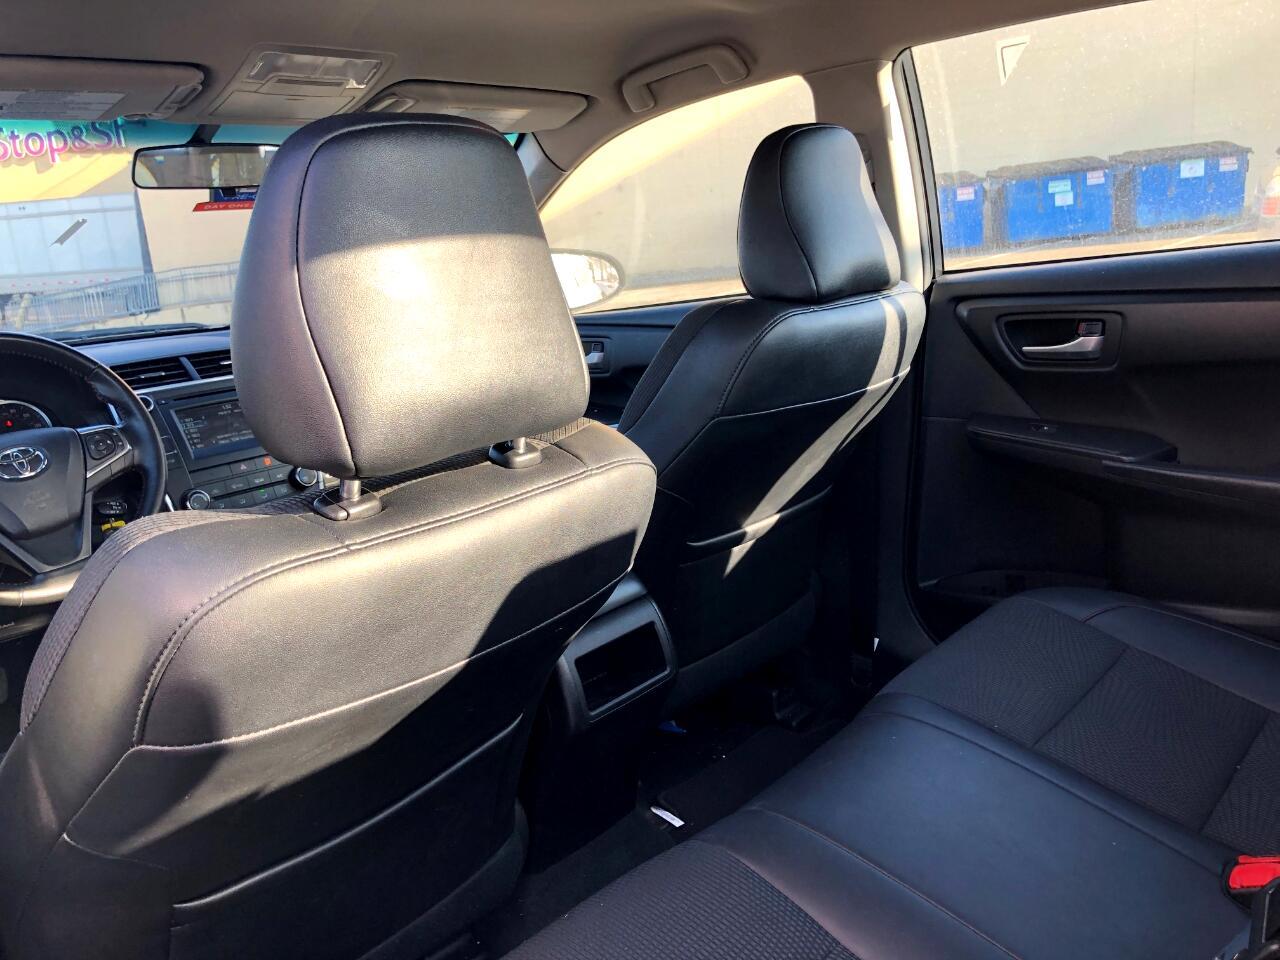 2016 Toyota Camry 4dr Sdn I4 Auto SE w/Special Edition Pkg (Natl)